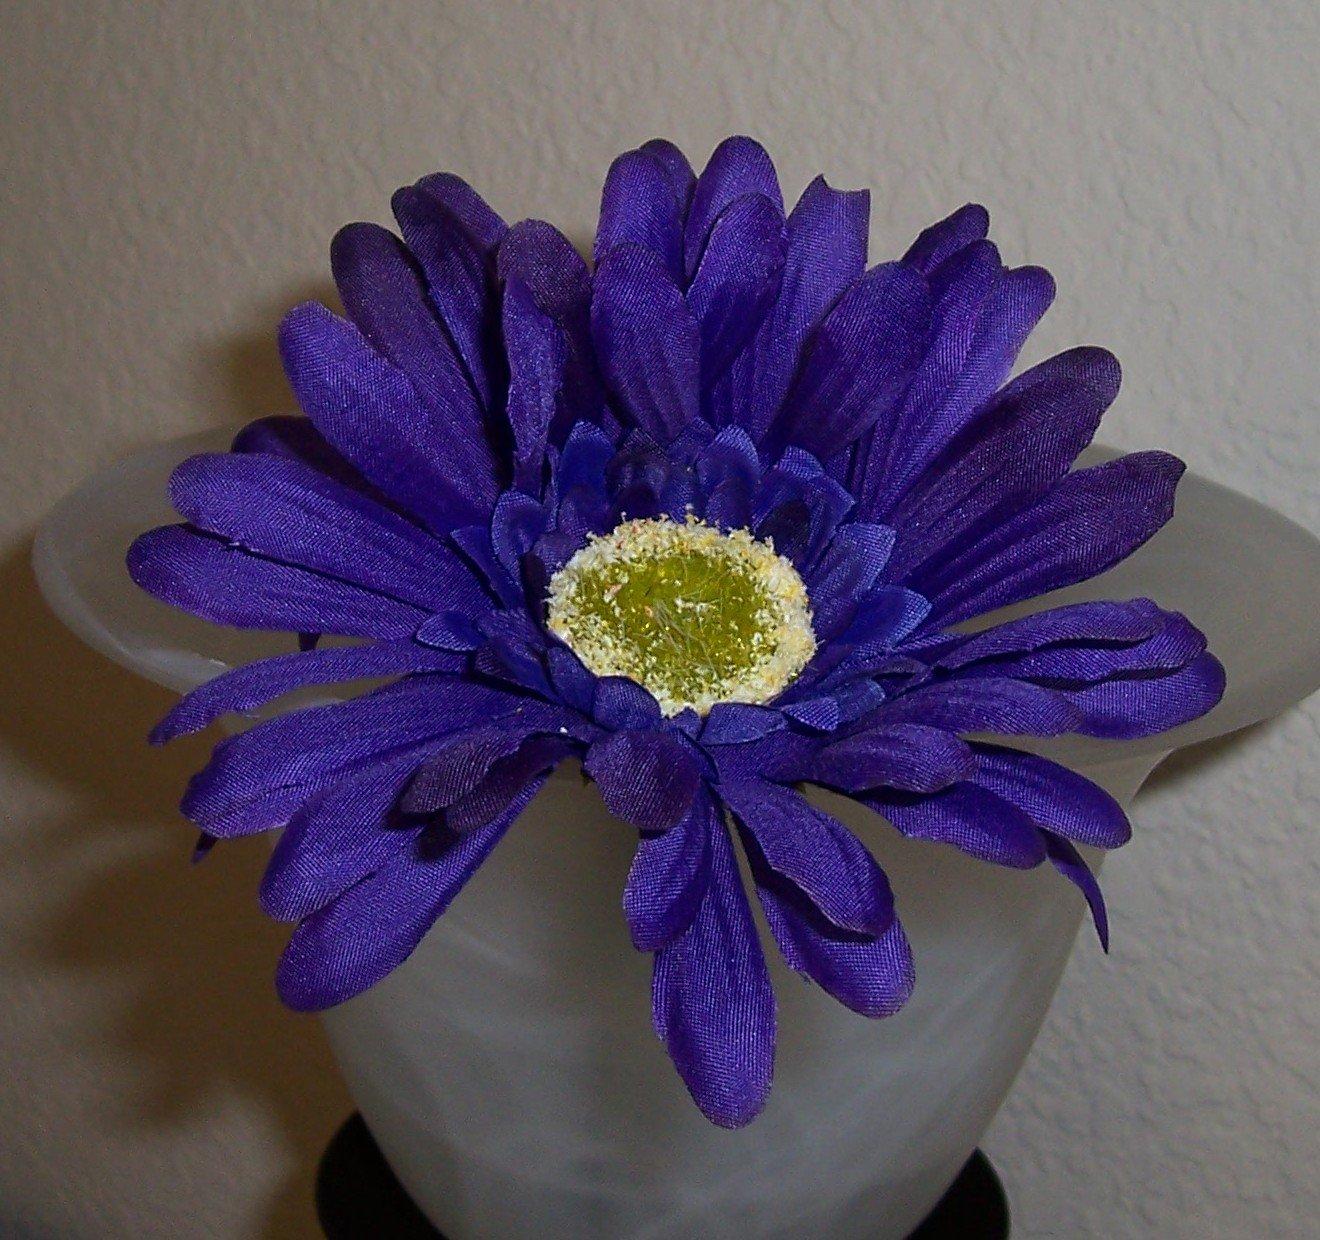 Deep Purple Bloomin' Pens - Gerbera Daisy flower pens